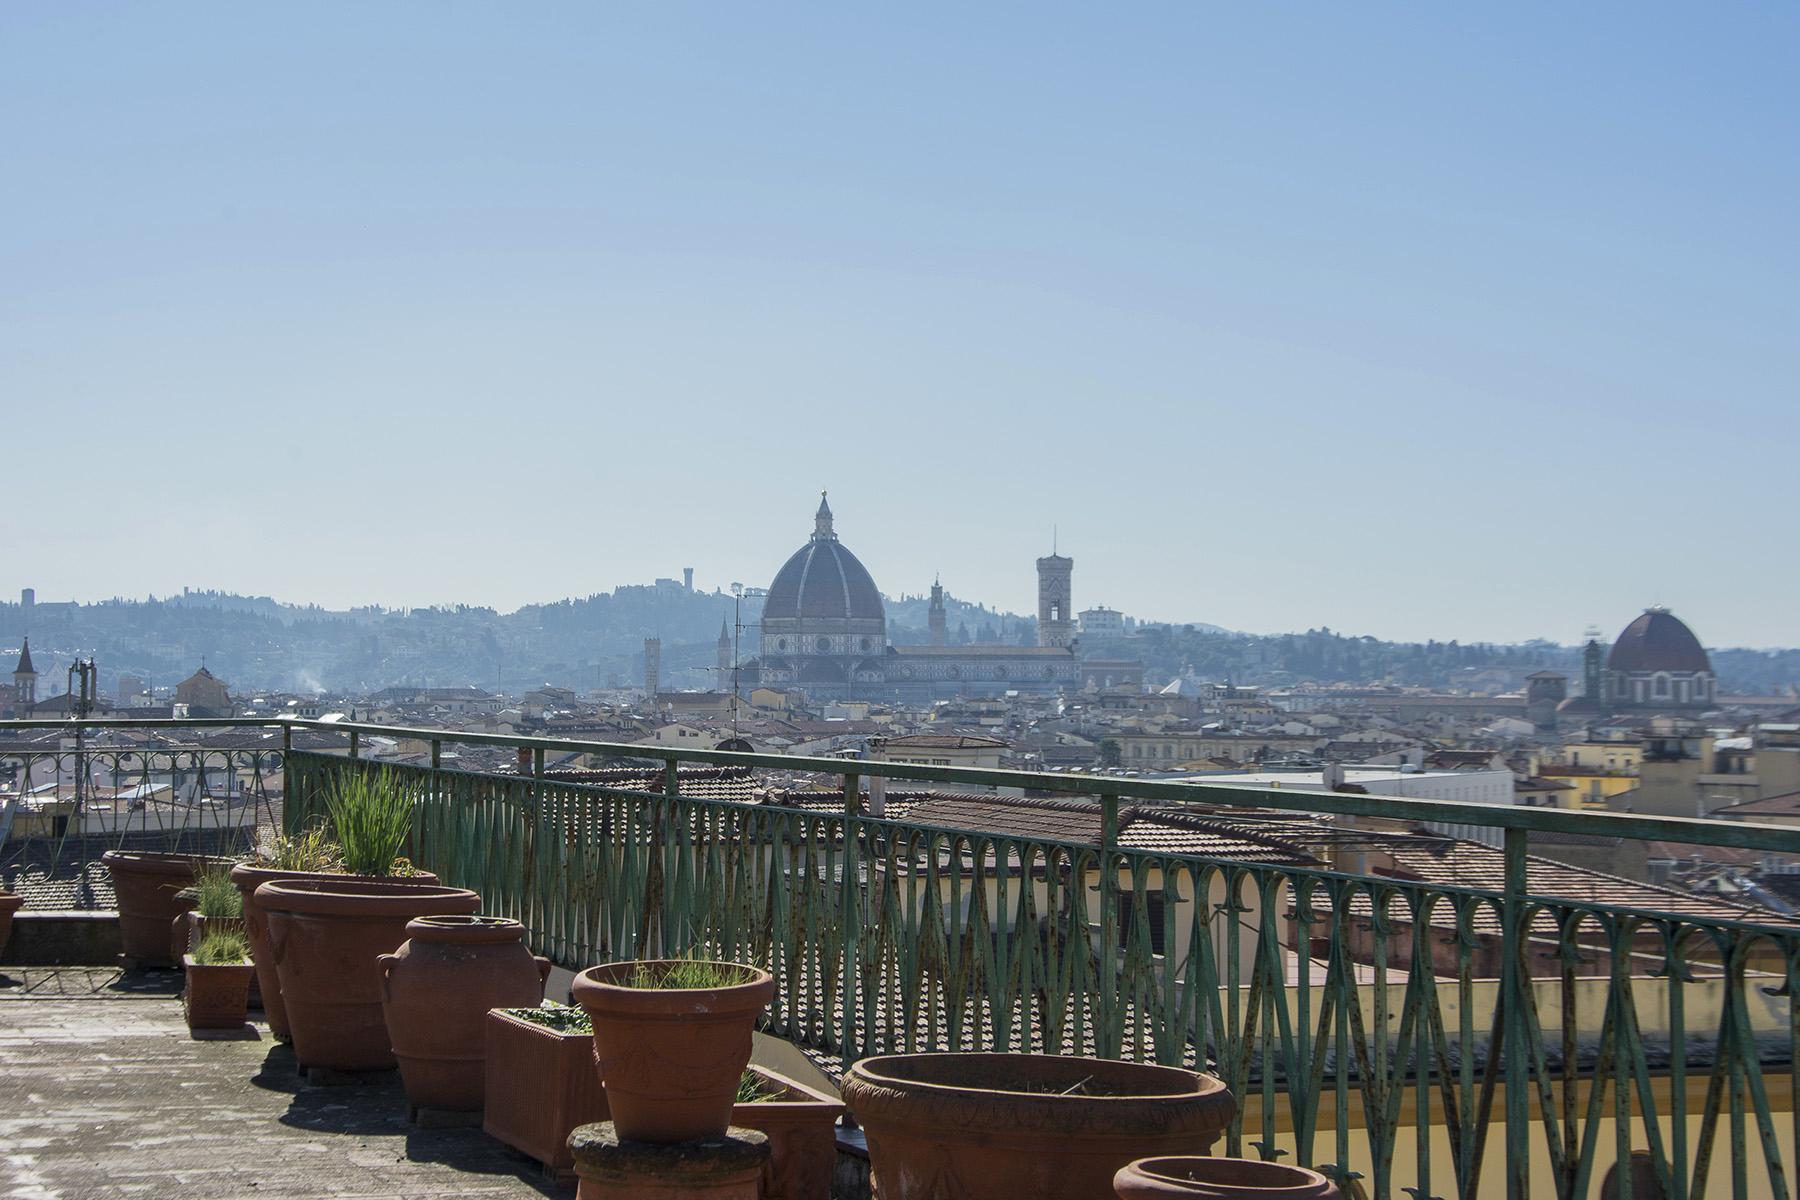 Attico in Vendita a Firenze: 5 locali, 400 mq - Foto 16